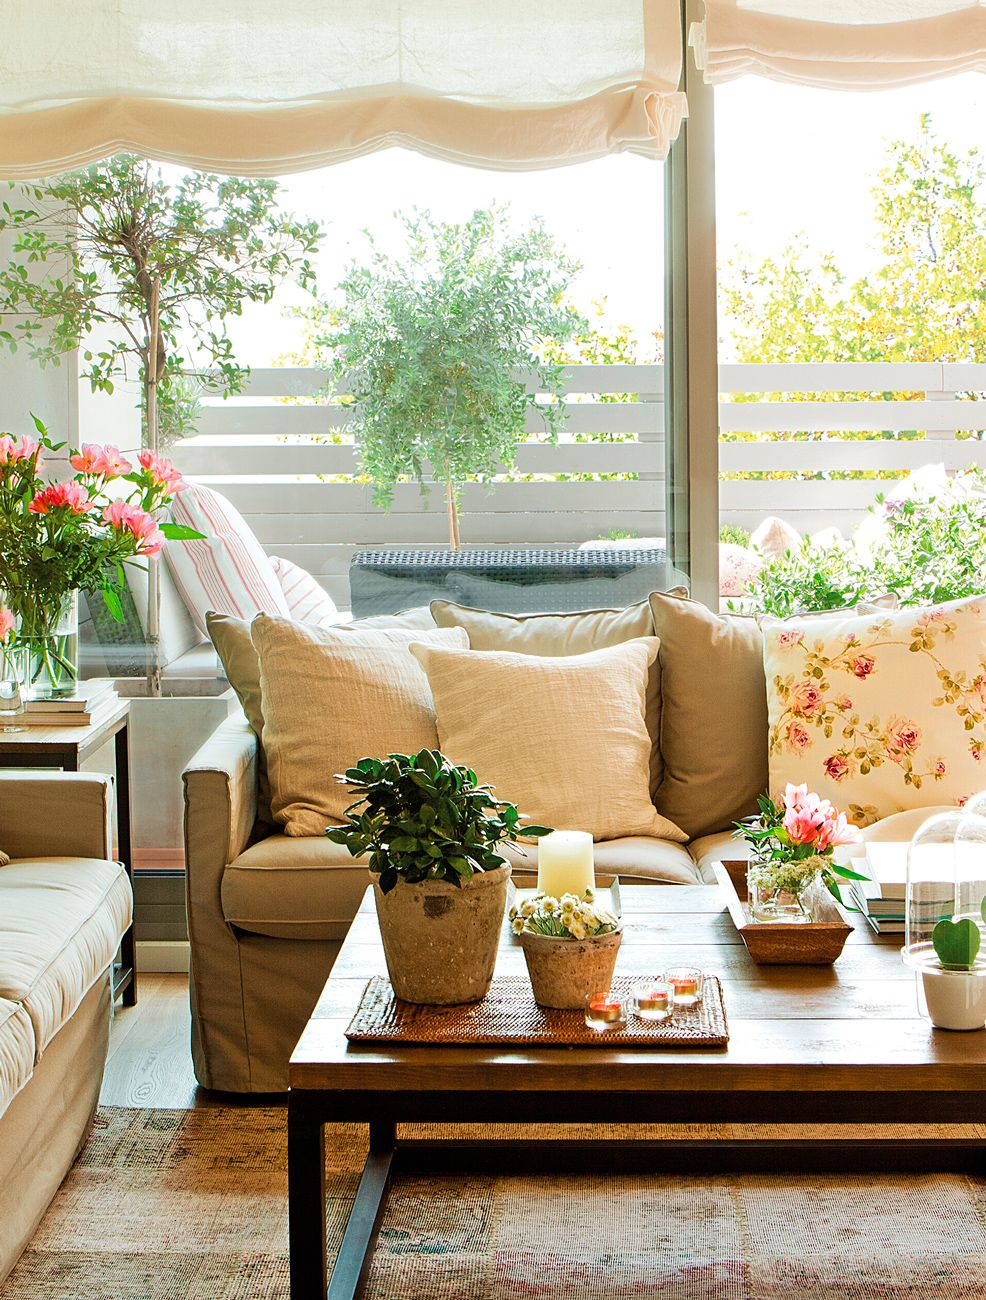 Sal n con vistas a la terraza sof con cojines mesa de for Terrazas con sofas